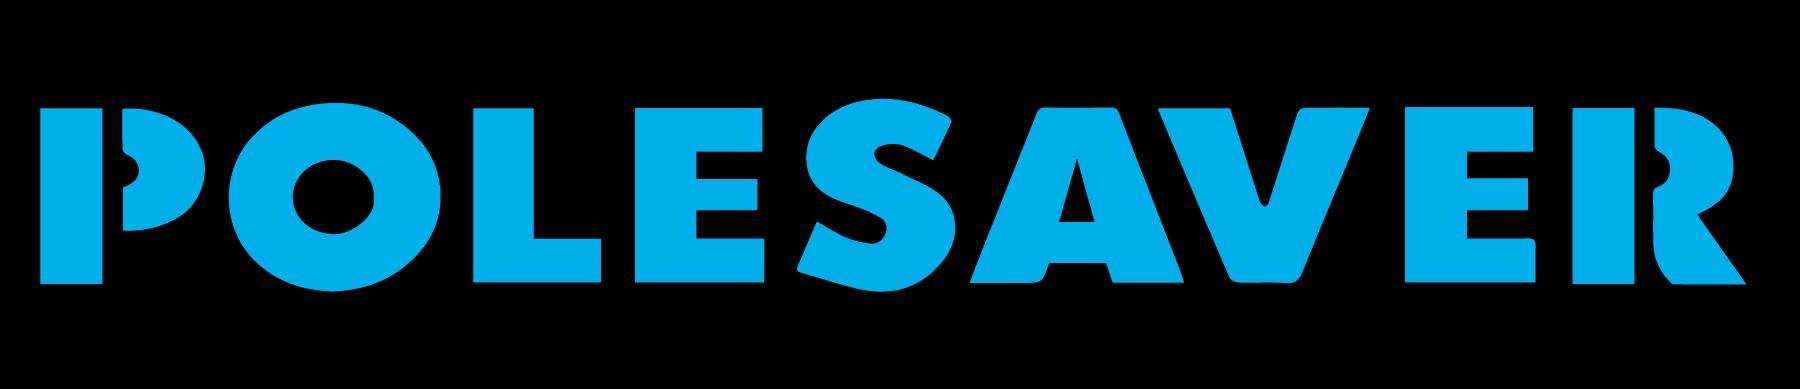 Polesaver Logo - No Byline